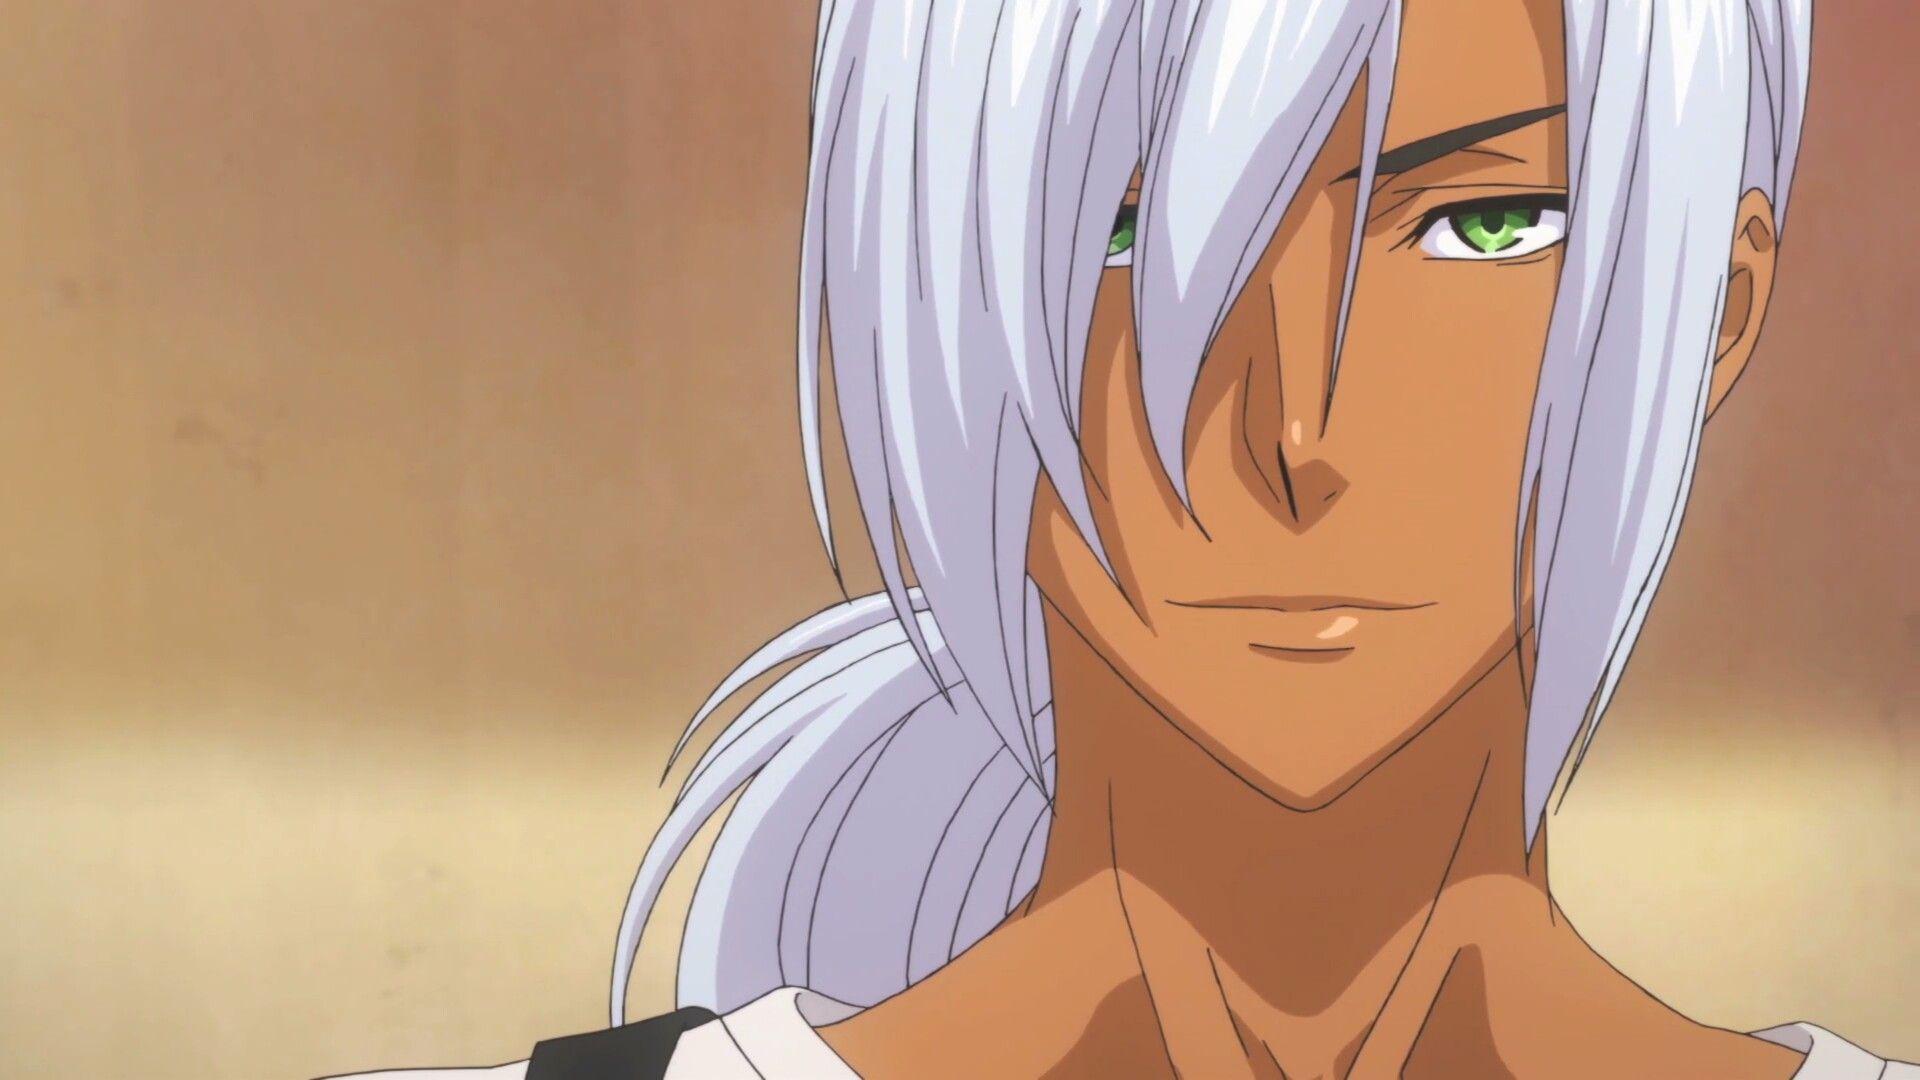 12 Tokoh Anime Berambut Putih/Perak, Manakah Favorit Mu? 12